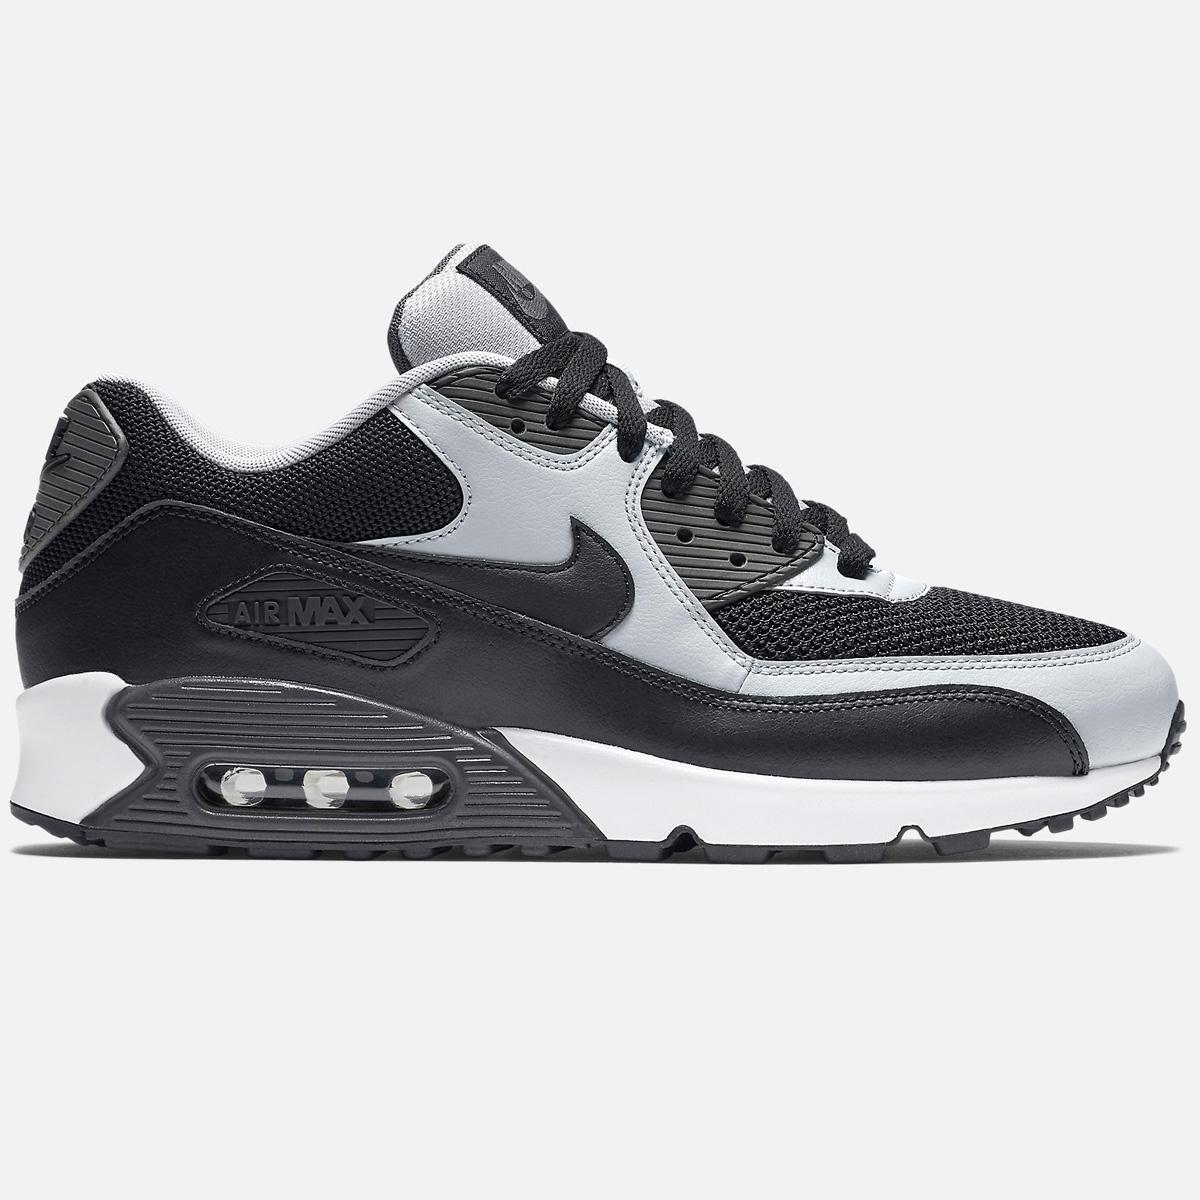 60868255cd Lyst - Nike Air Max 90 Essential-black Wolf Grey Anthracite in Black ...